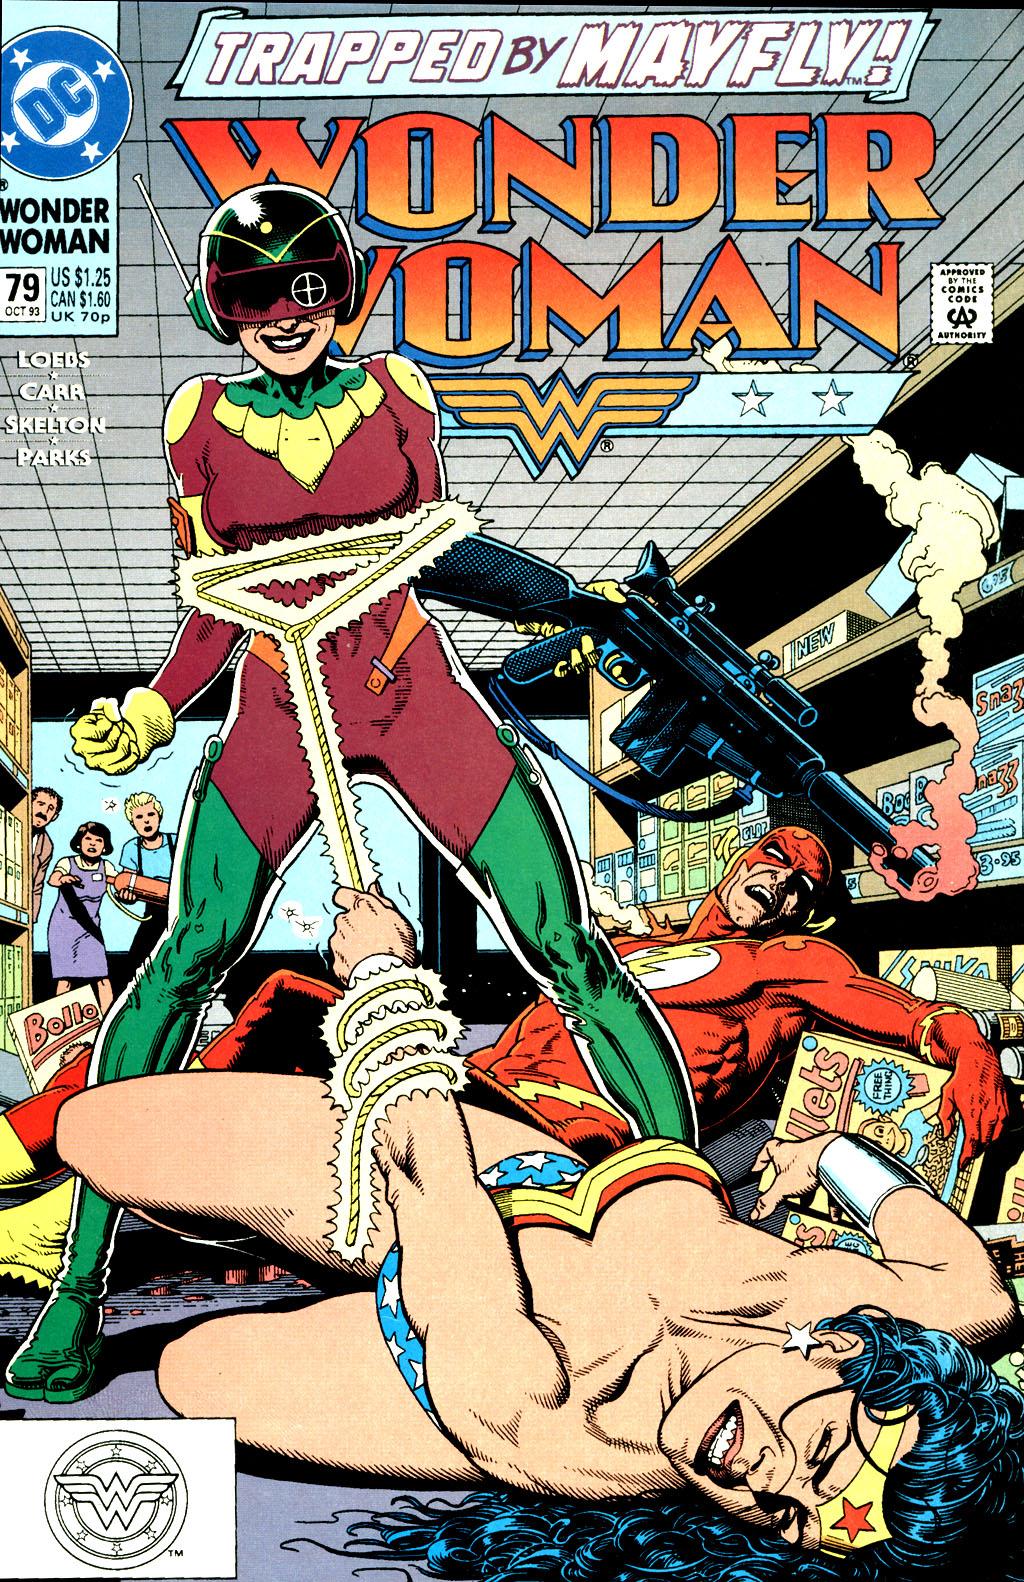 Read online Wonder Woman (1987) comic -  Issue #79 - 2